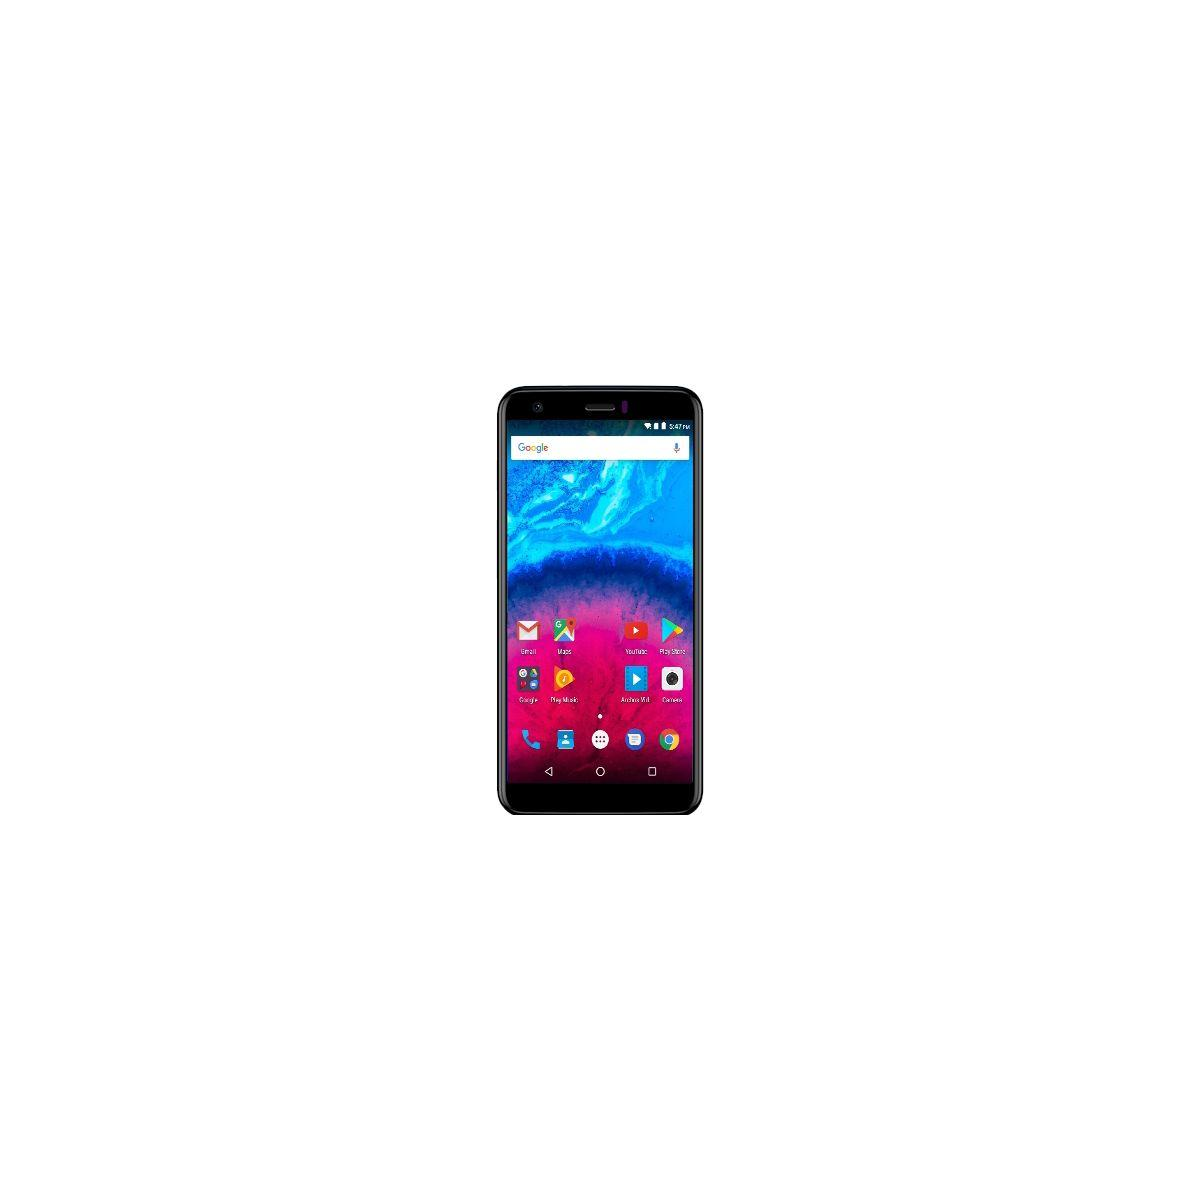 Smartphone archos core 55s 16go borderless